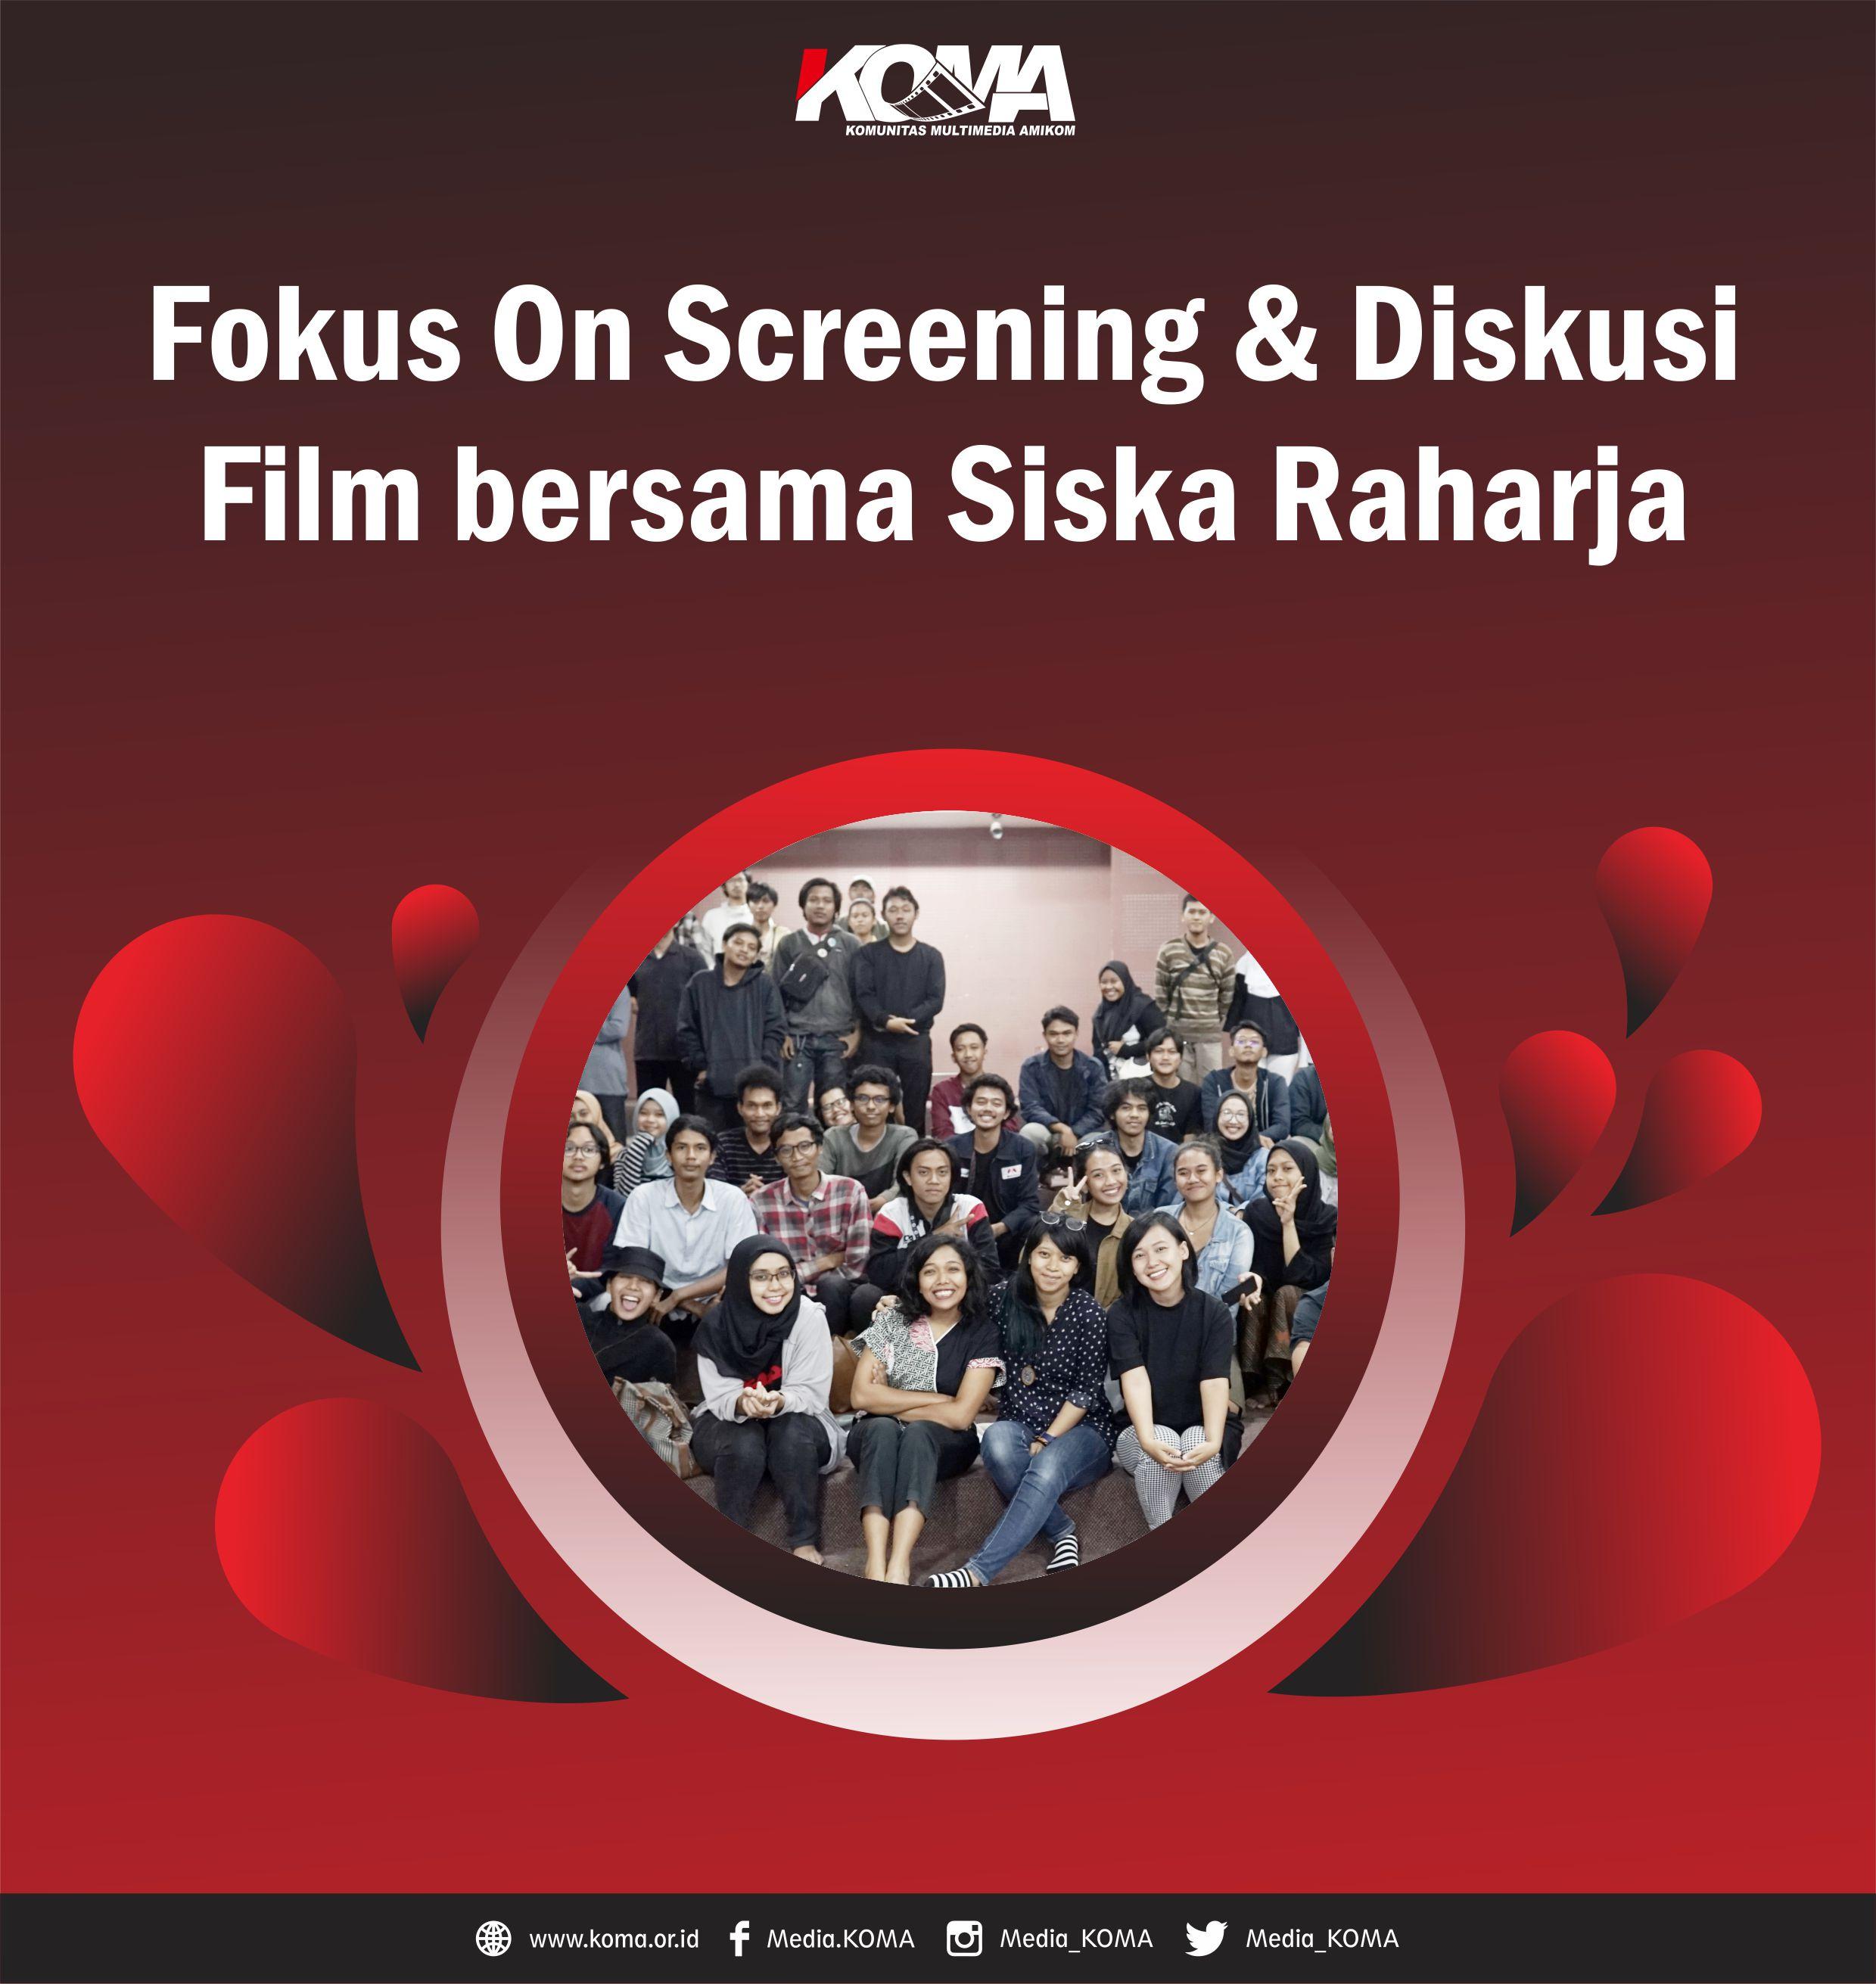 Fokus-On-Screening-dan-Diskusi-Film-bersama-Siska-Raharja